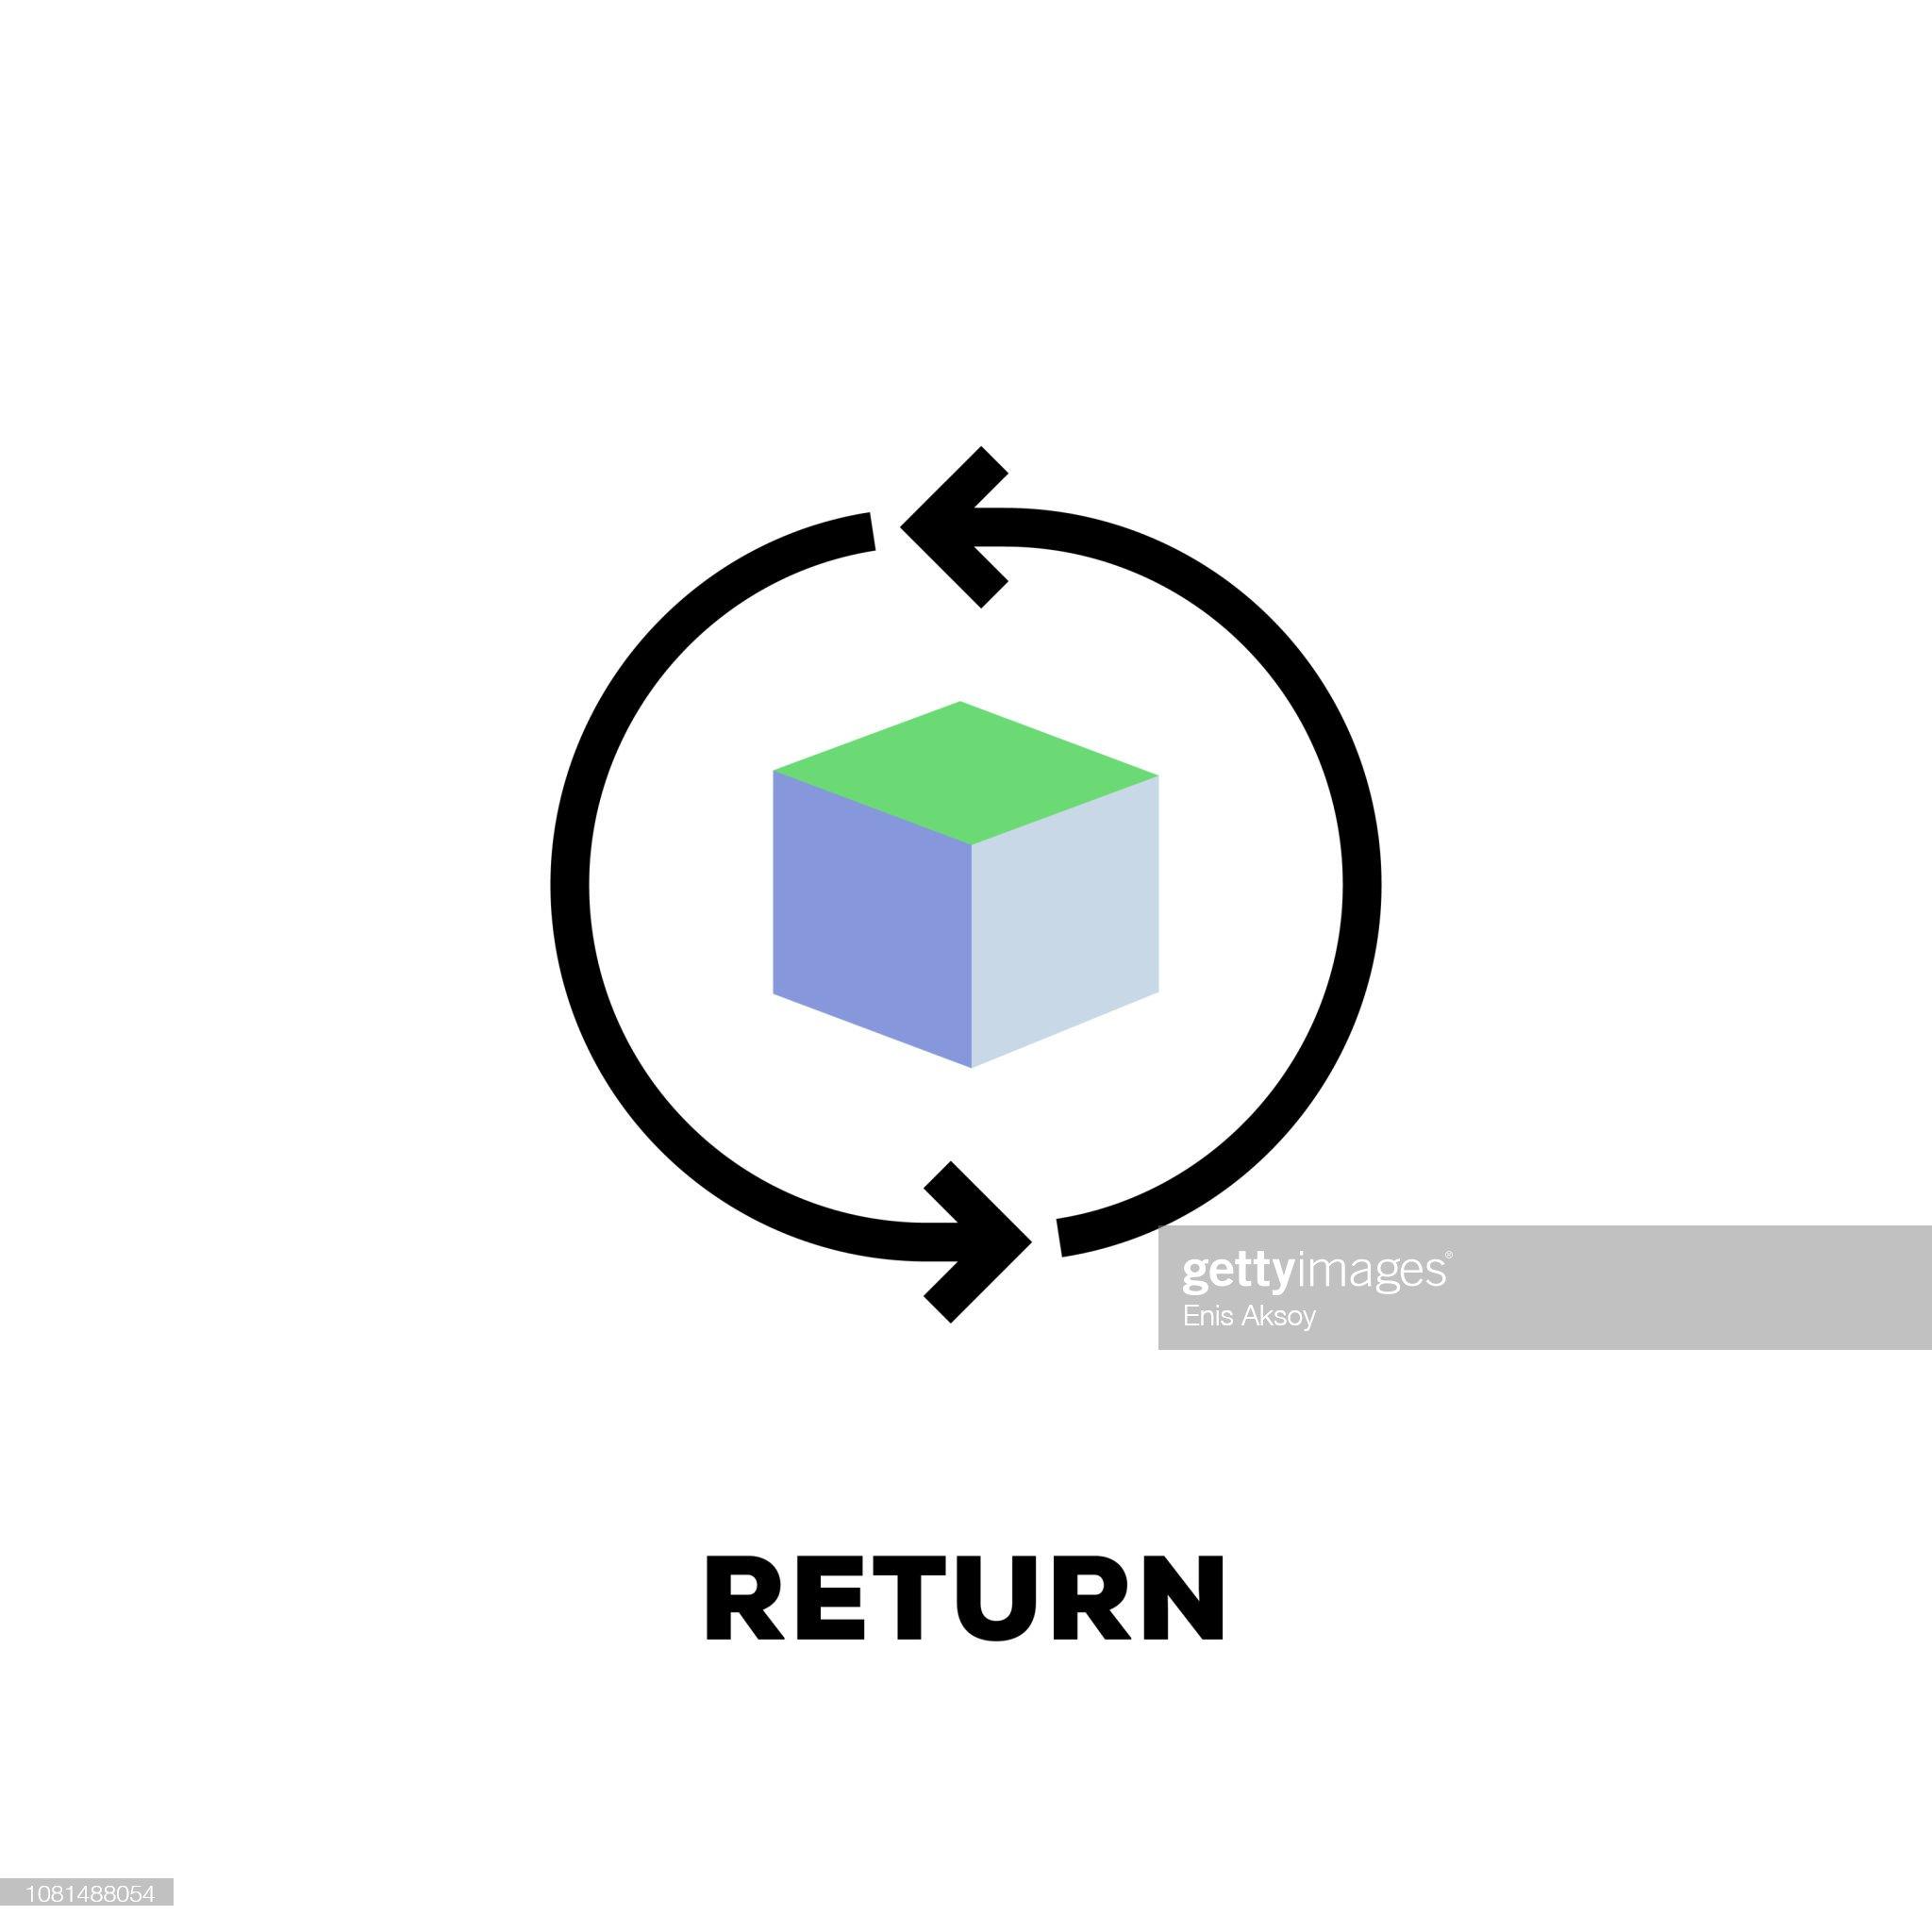 Return Line Icon : stock illustration